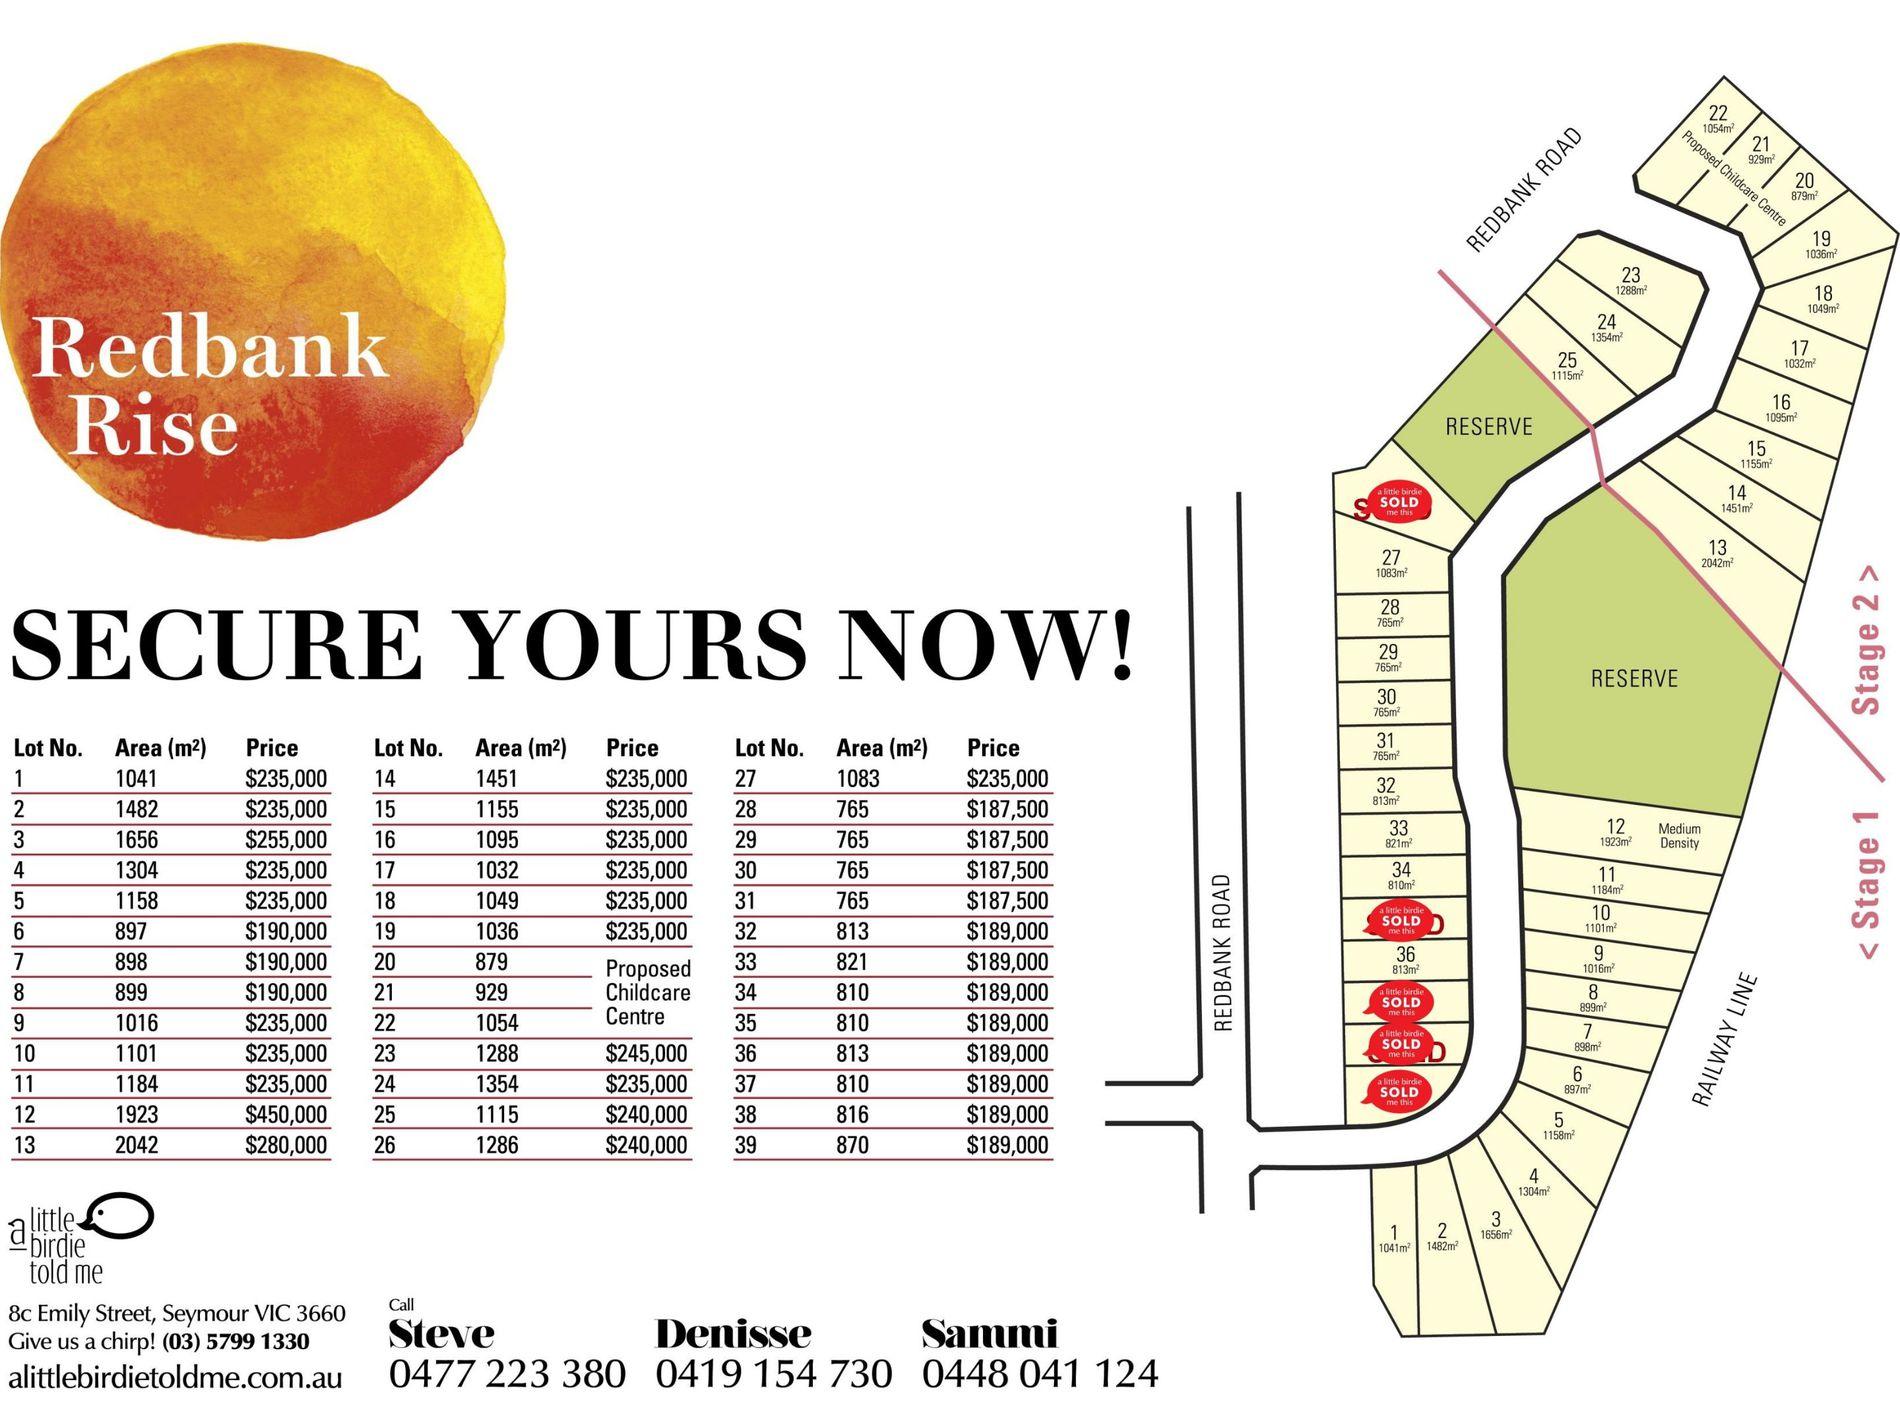 Lot 34 Redbank Rise, Seymour